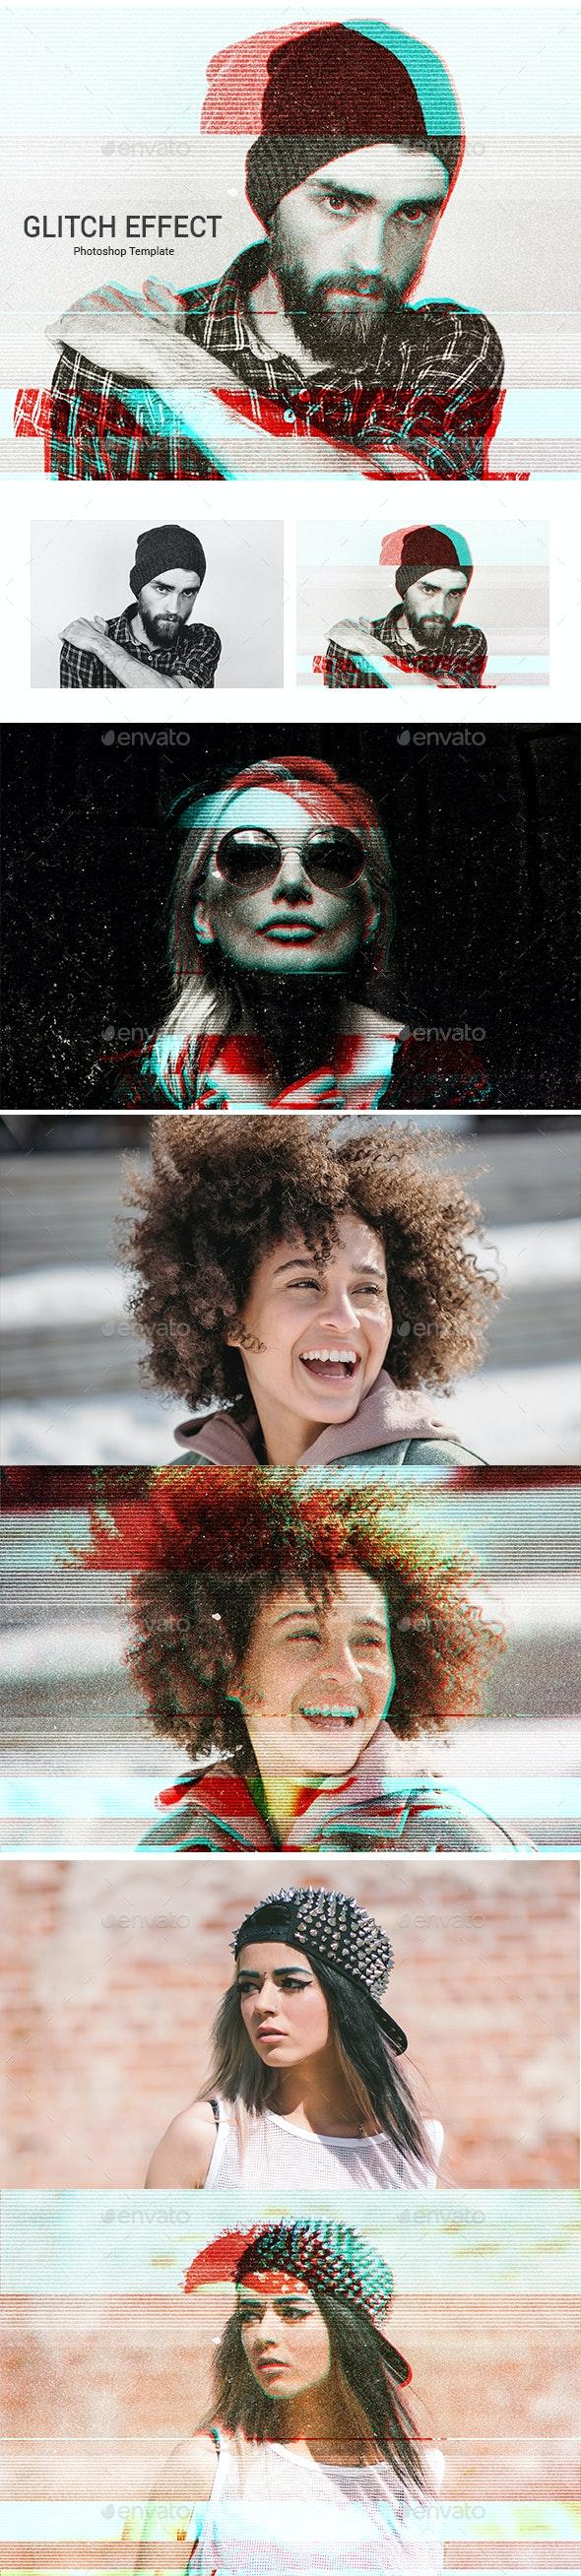 Glitch effect photoshop - Tech / Futuristic Photo Templates